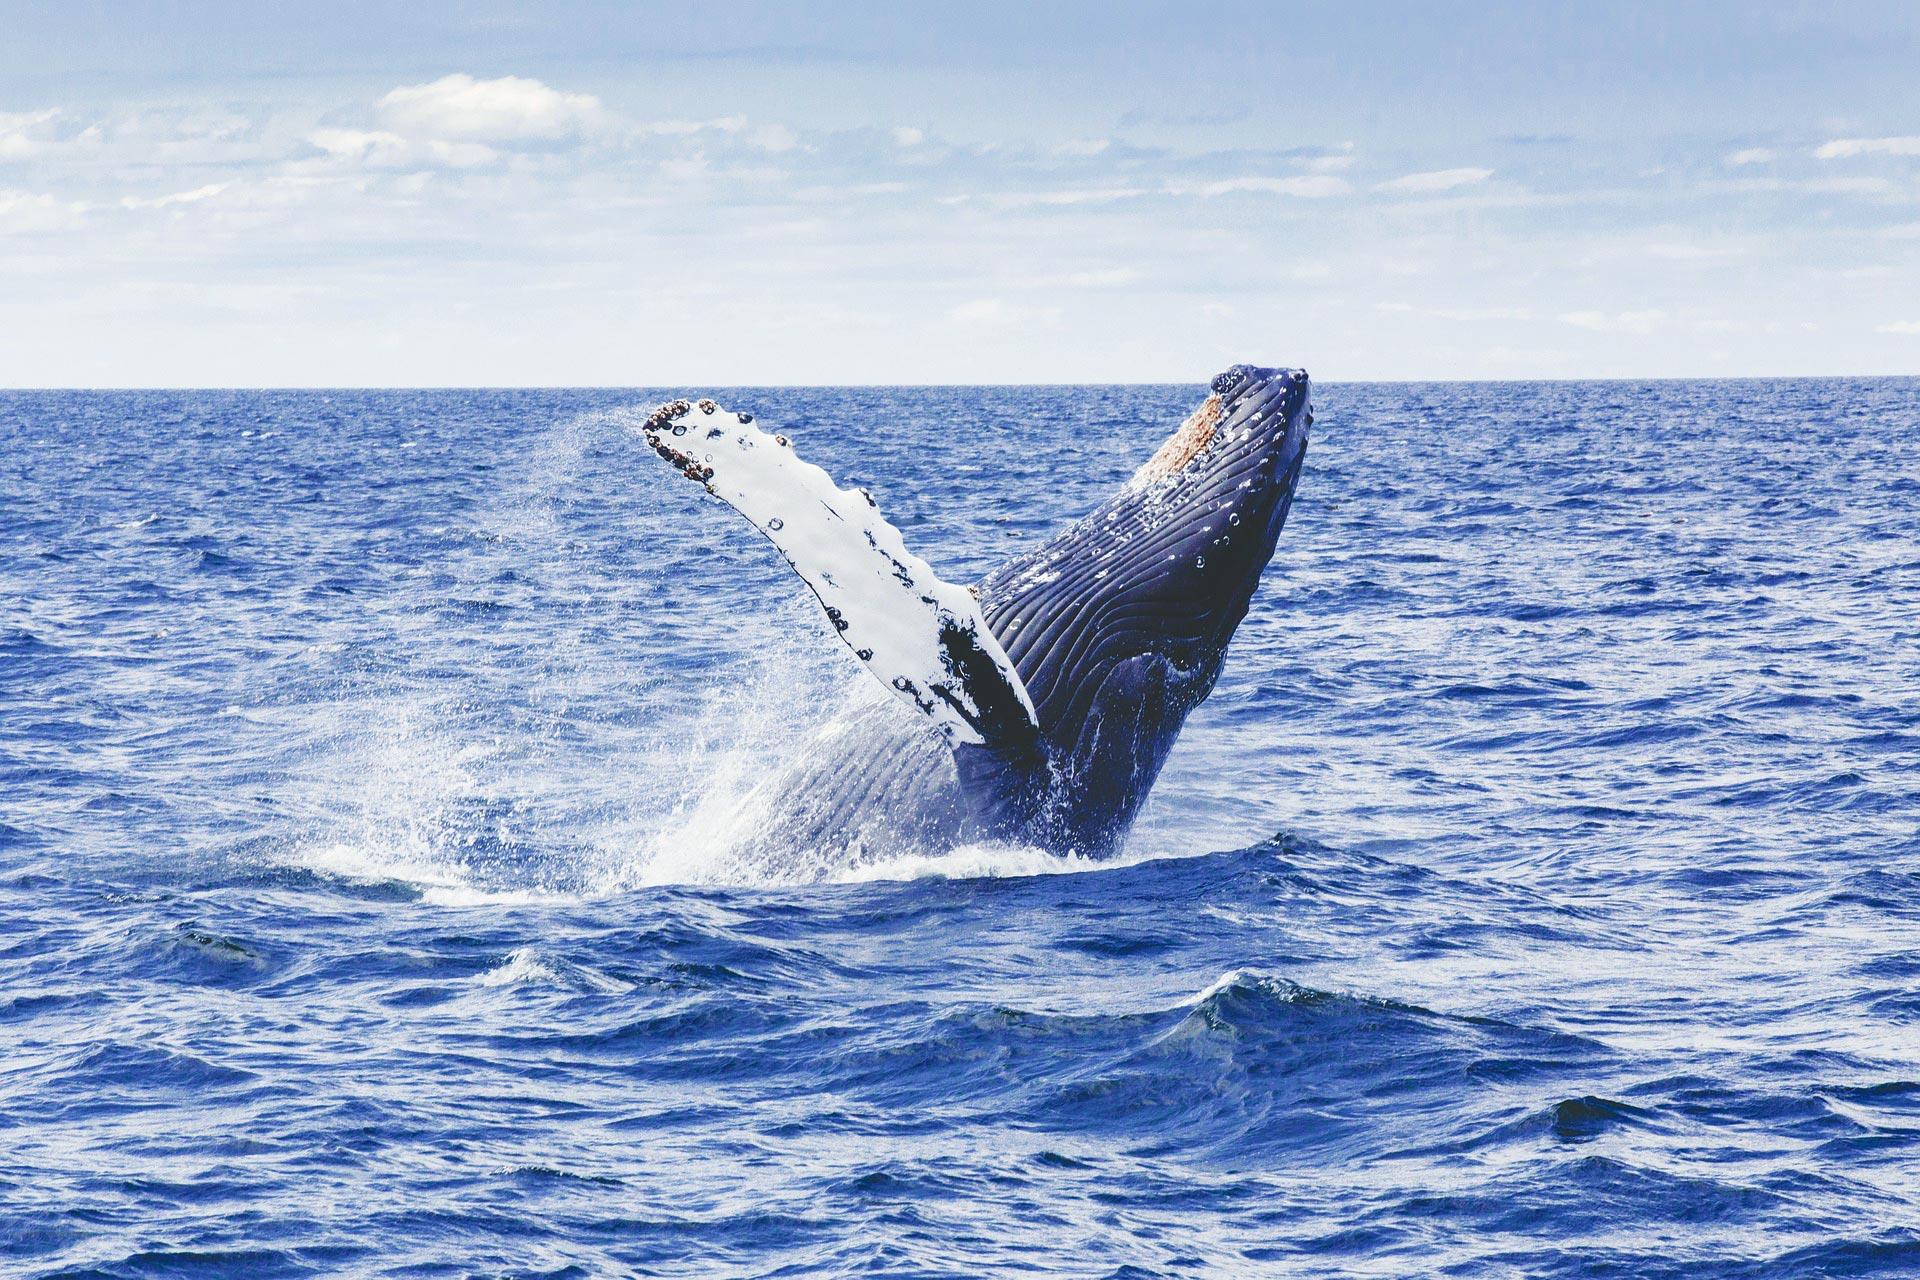 Walbeobachtung im Atlantik